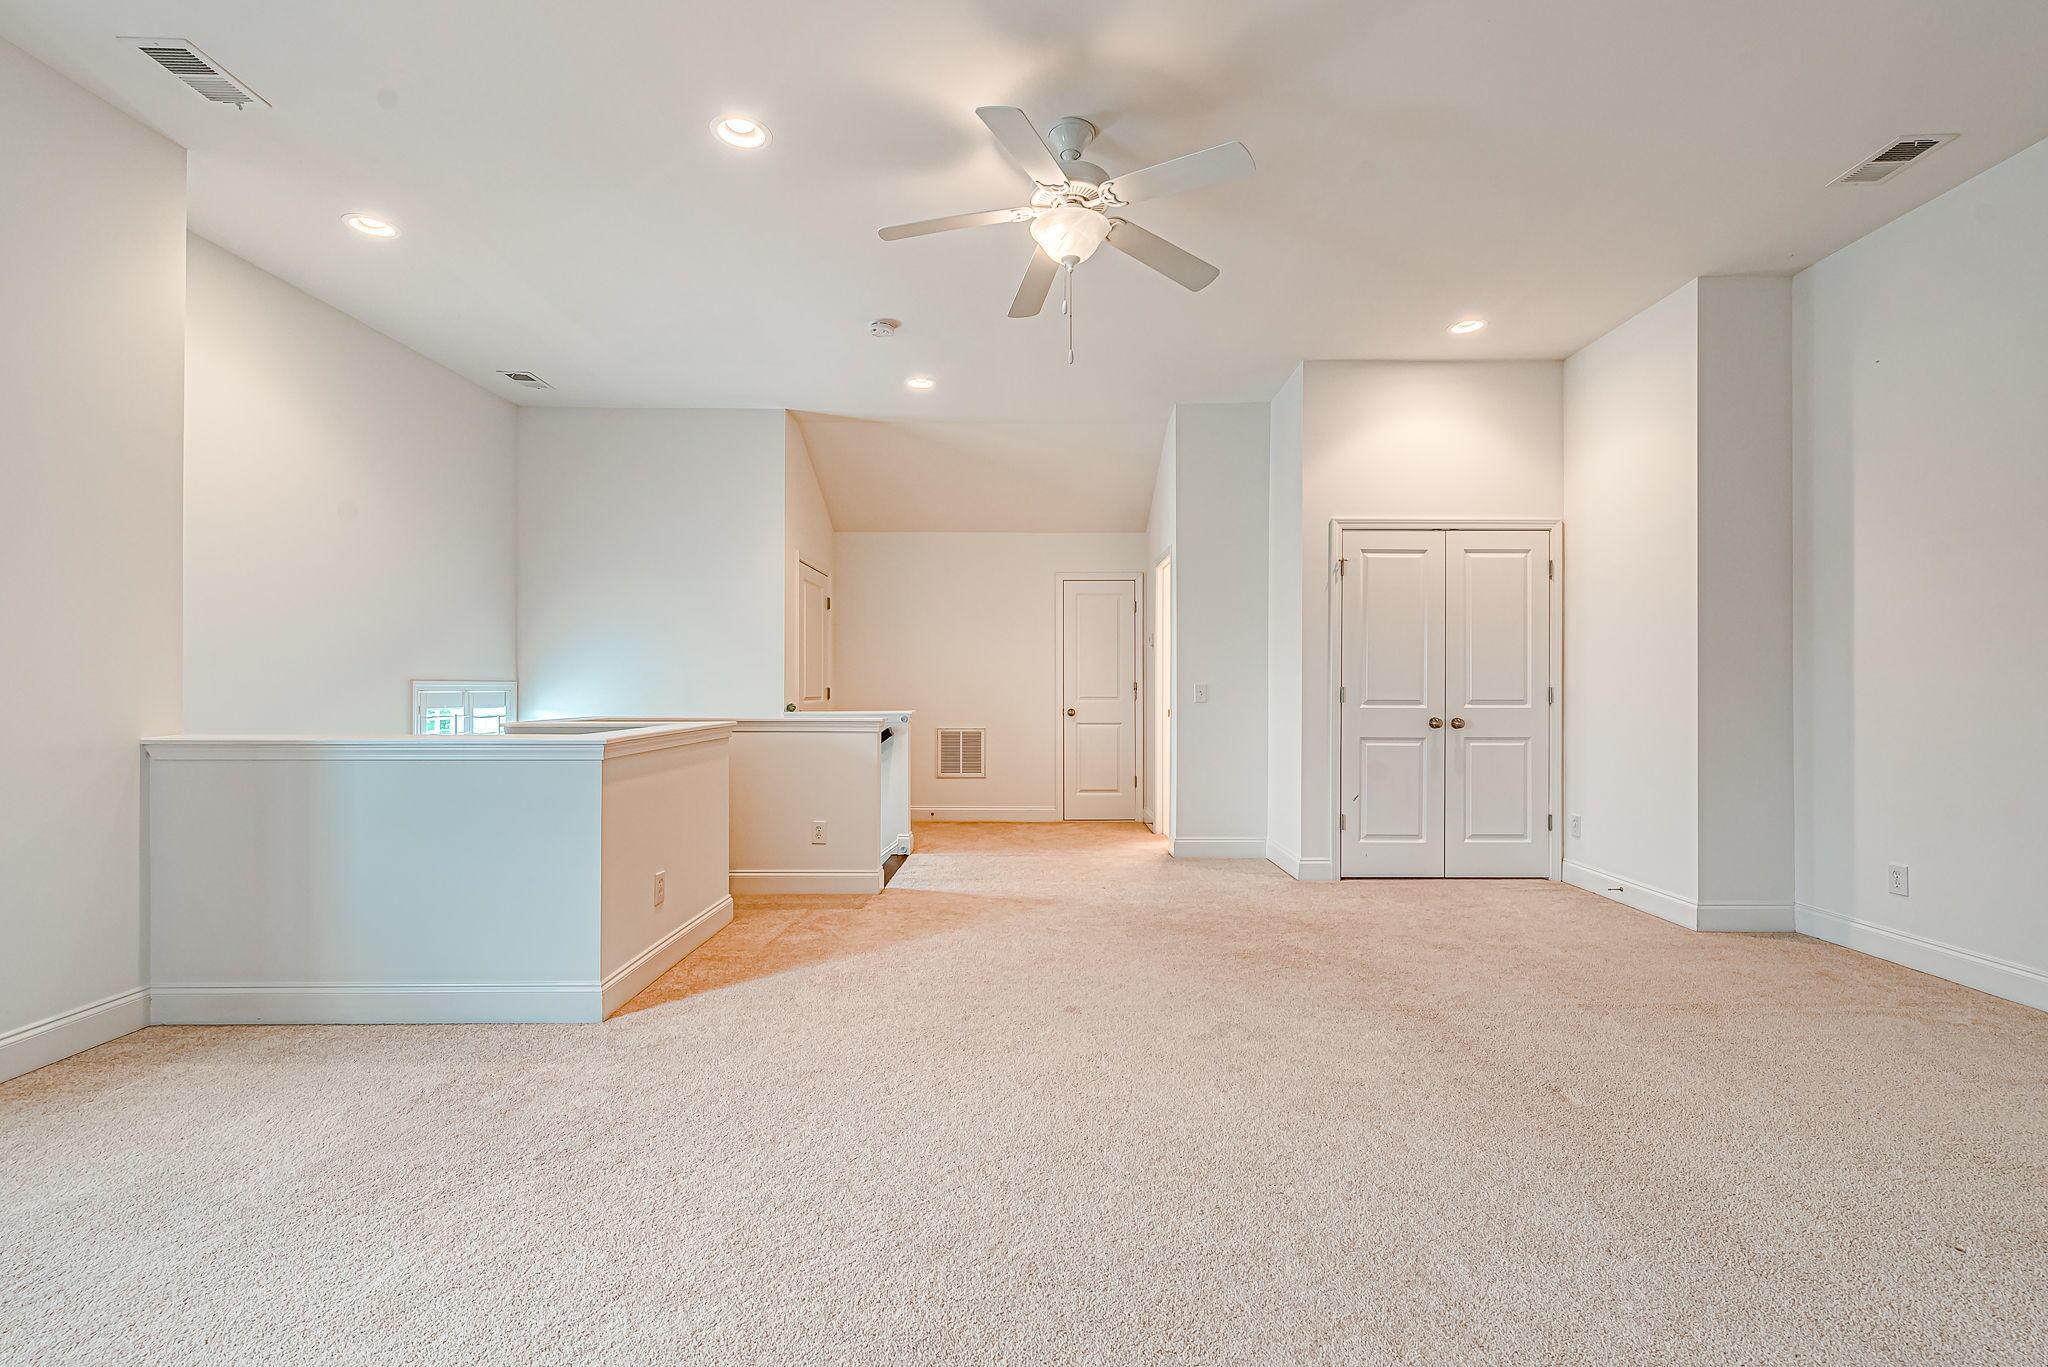 Dunes West Homes For Sale - 2476 Kings Gate, Mount Pleasant, SC - 39